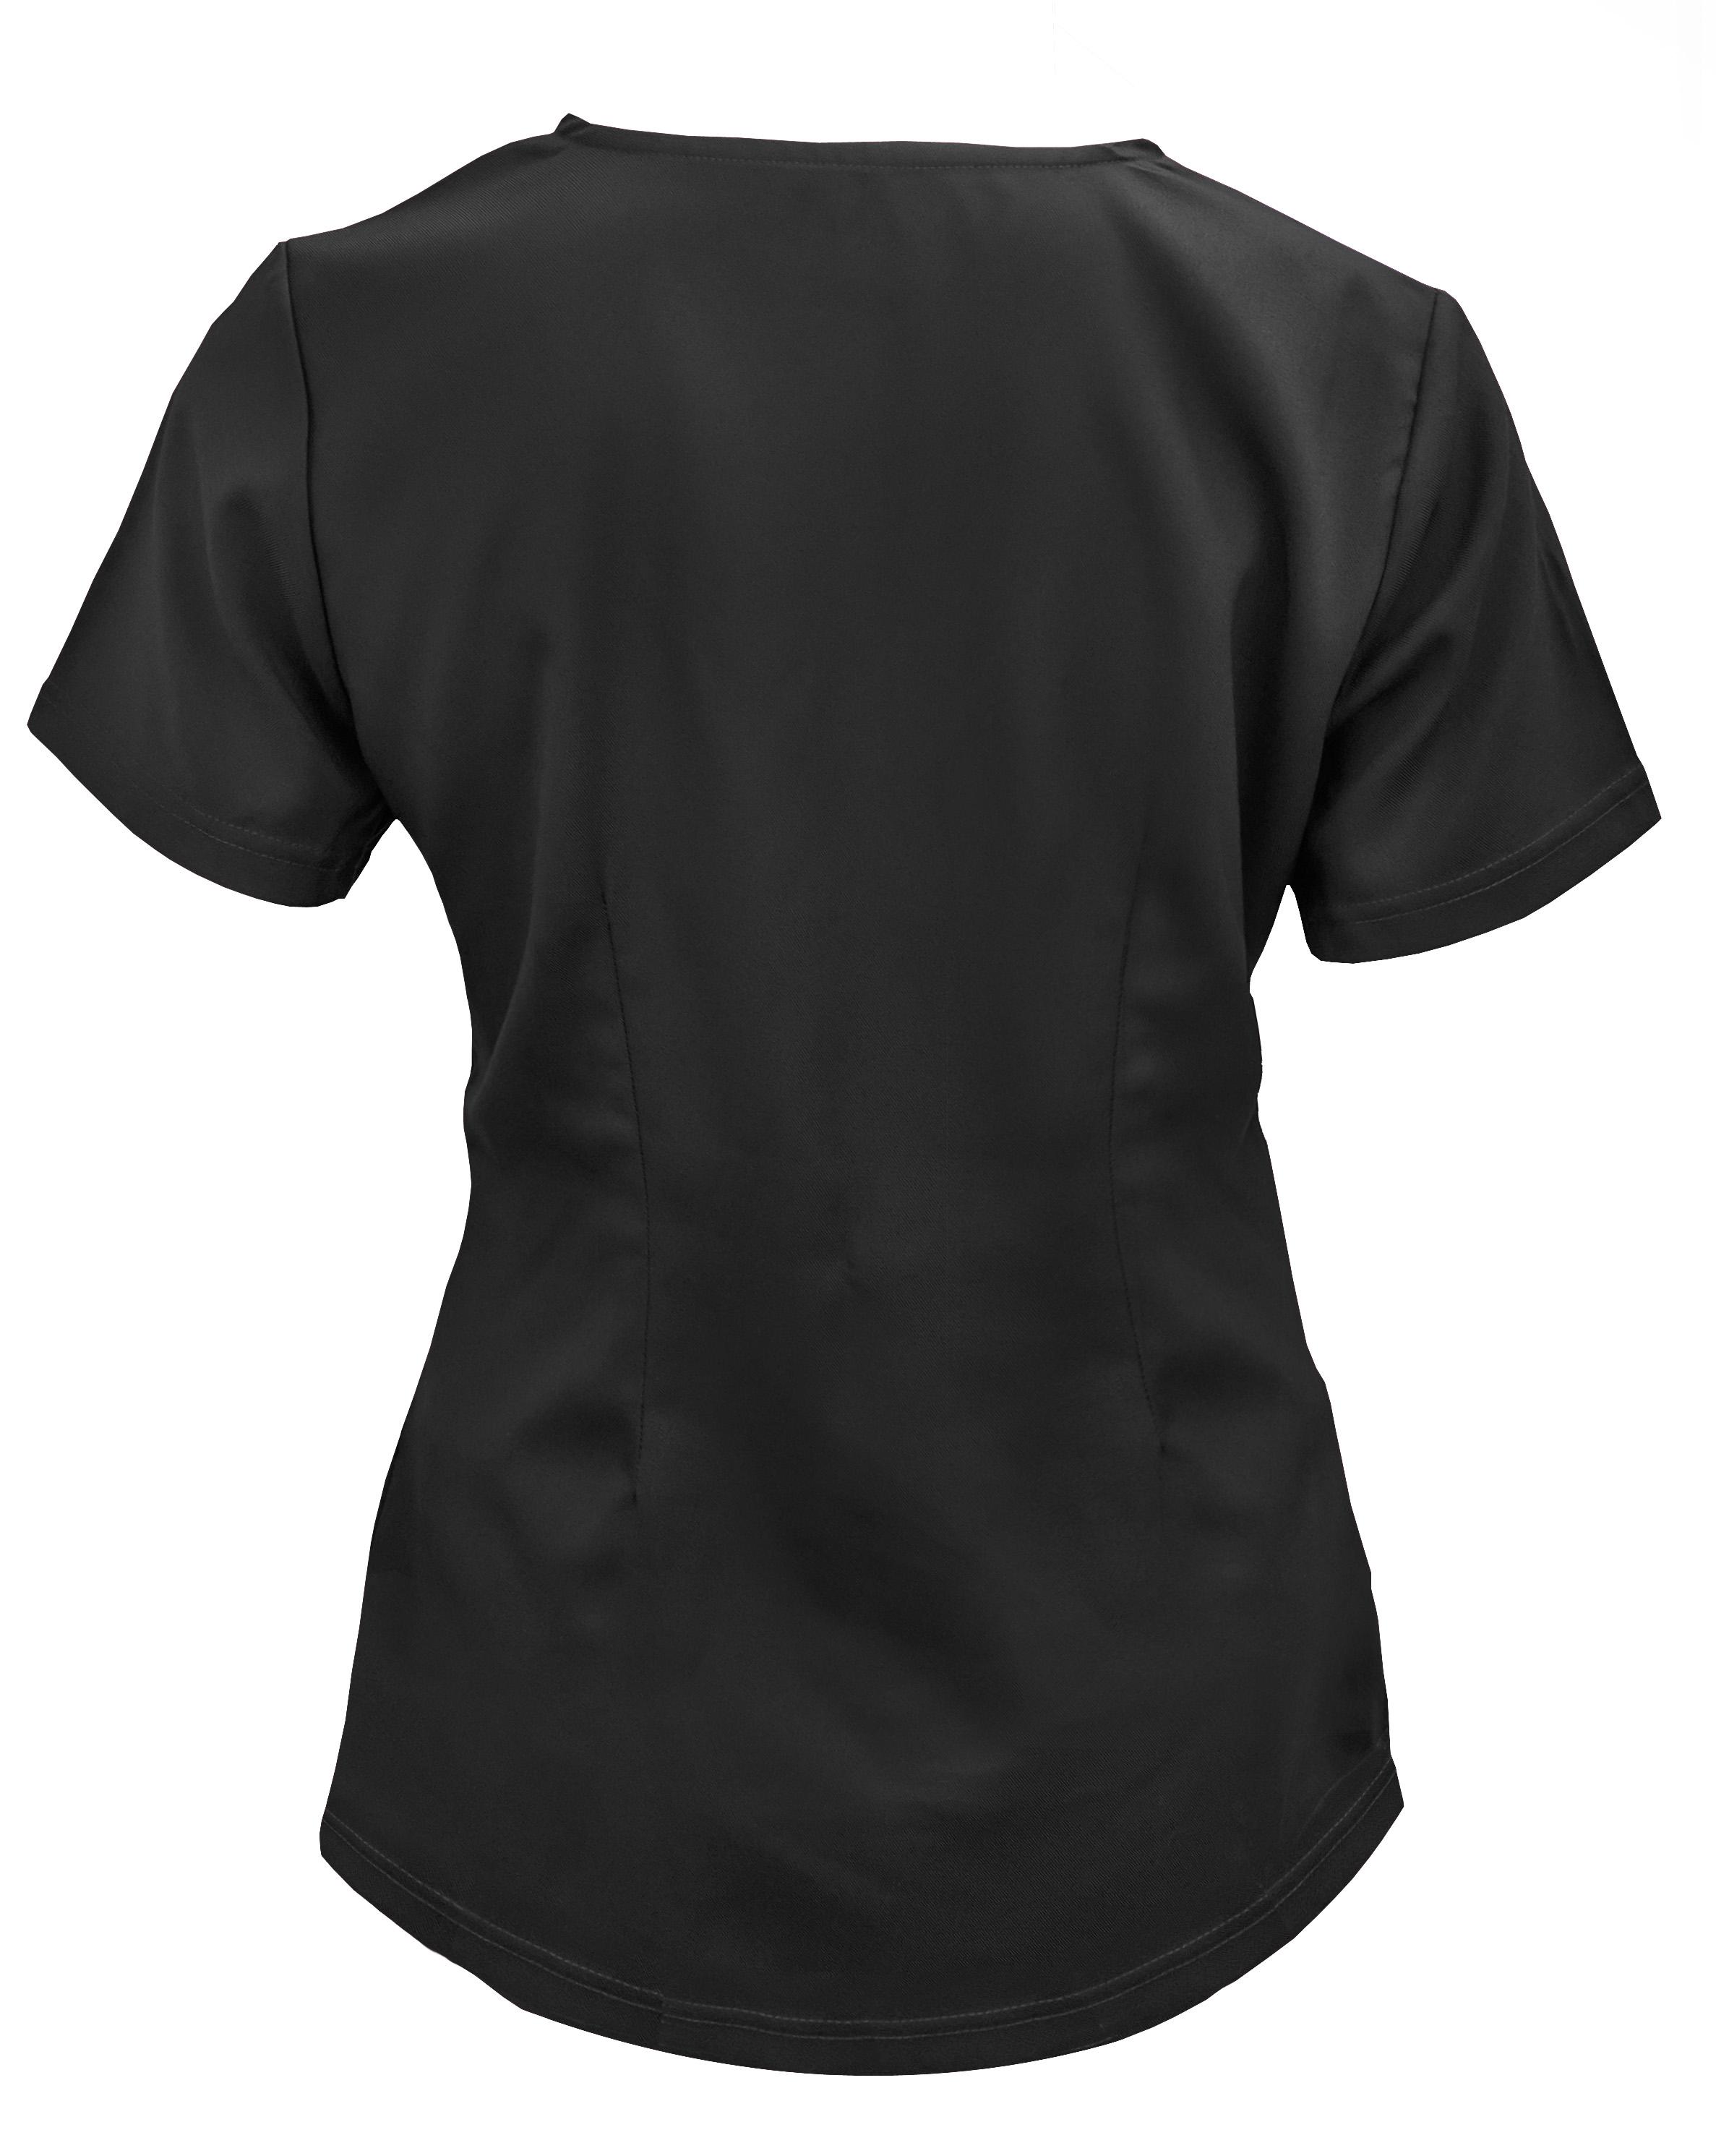 Soulful-Scrubs-Women-039-s-2336-2-Pocket-V-Neck-Scrub-Top miniature 7